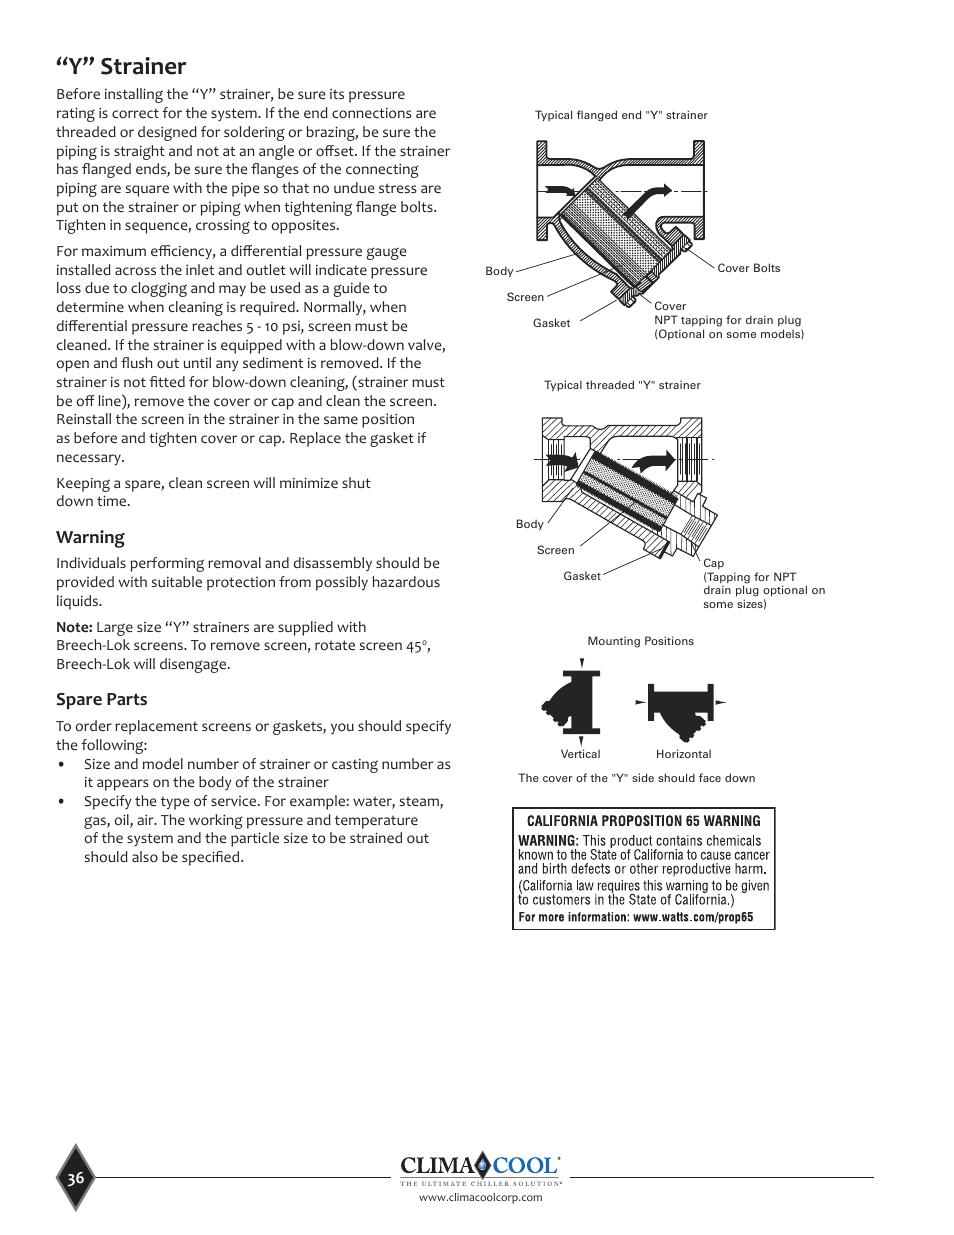 y u201d strainer warning spare parts climacool uca manual user manual rh manualsdir com Owner's Manual Manuals in PDF